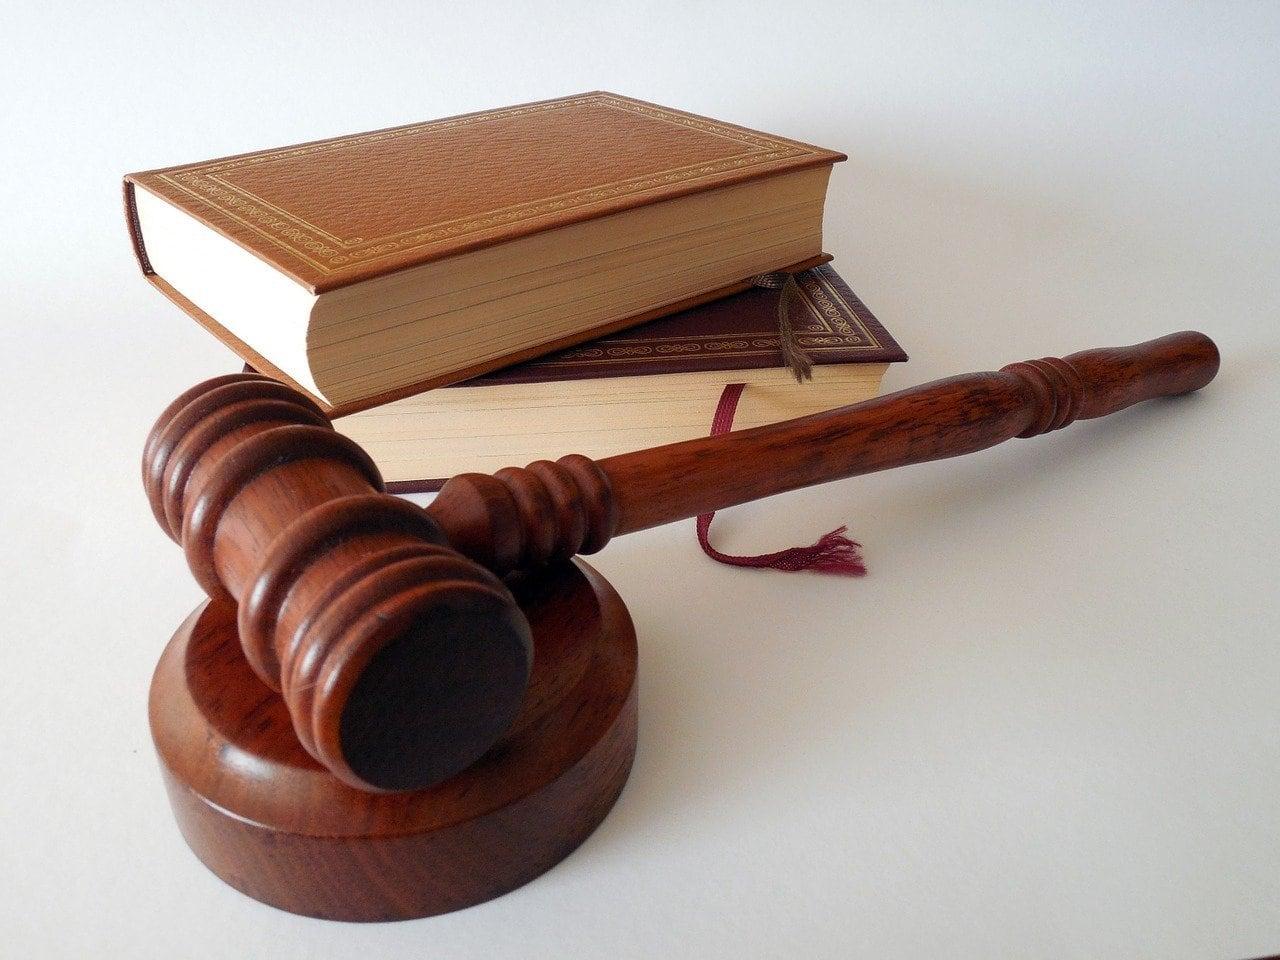 Ilmu Hukum - Jurusan Favorit di UNHAS Makassar dan Paling Banyak Peminat Universitas Hasanuddin